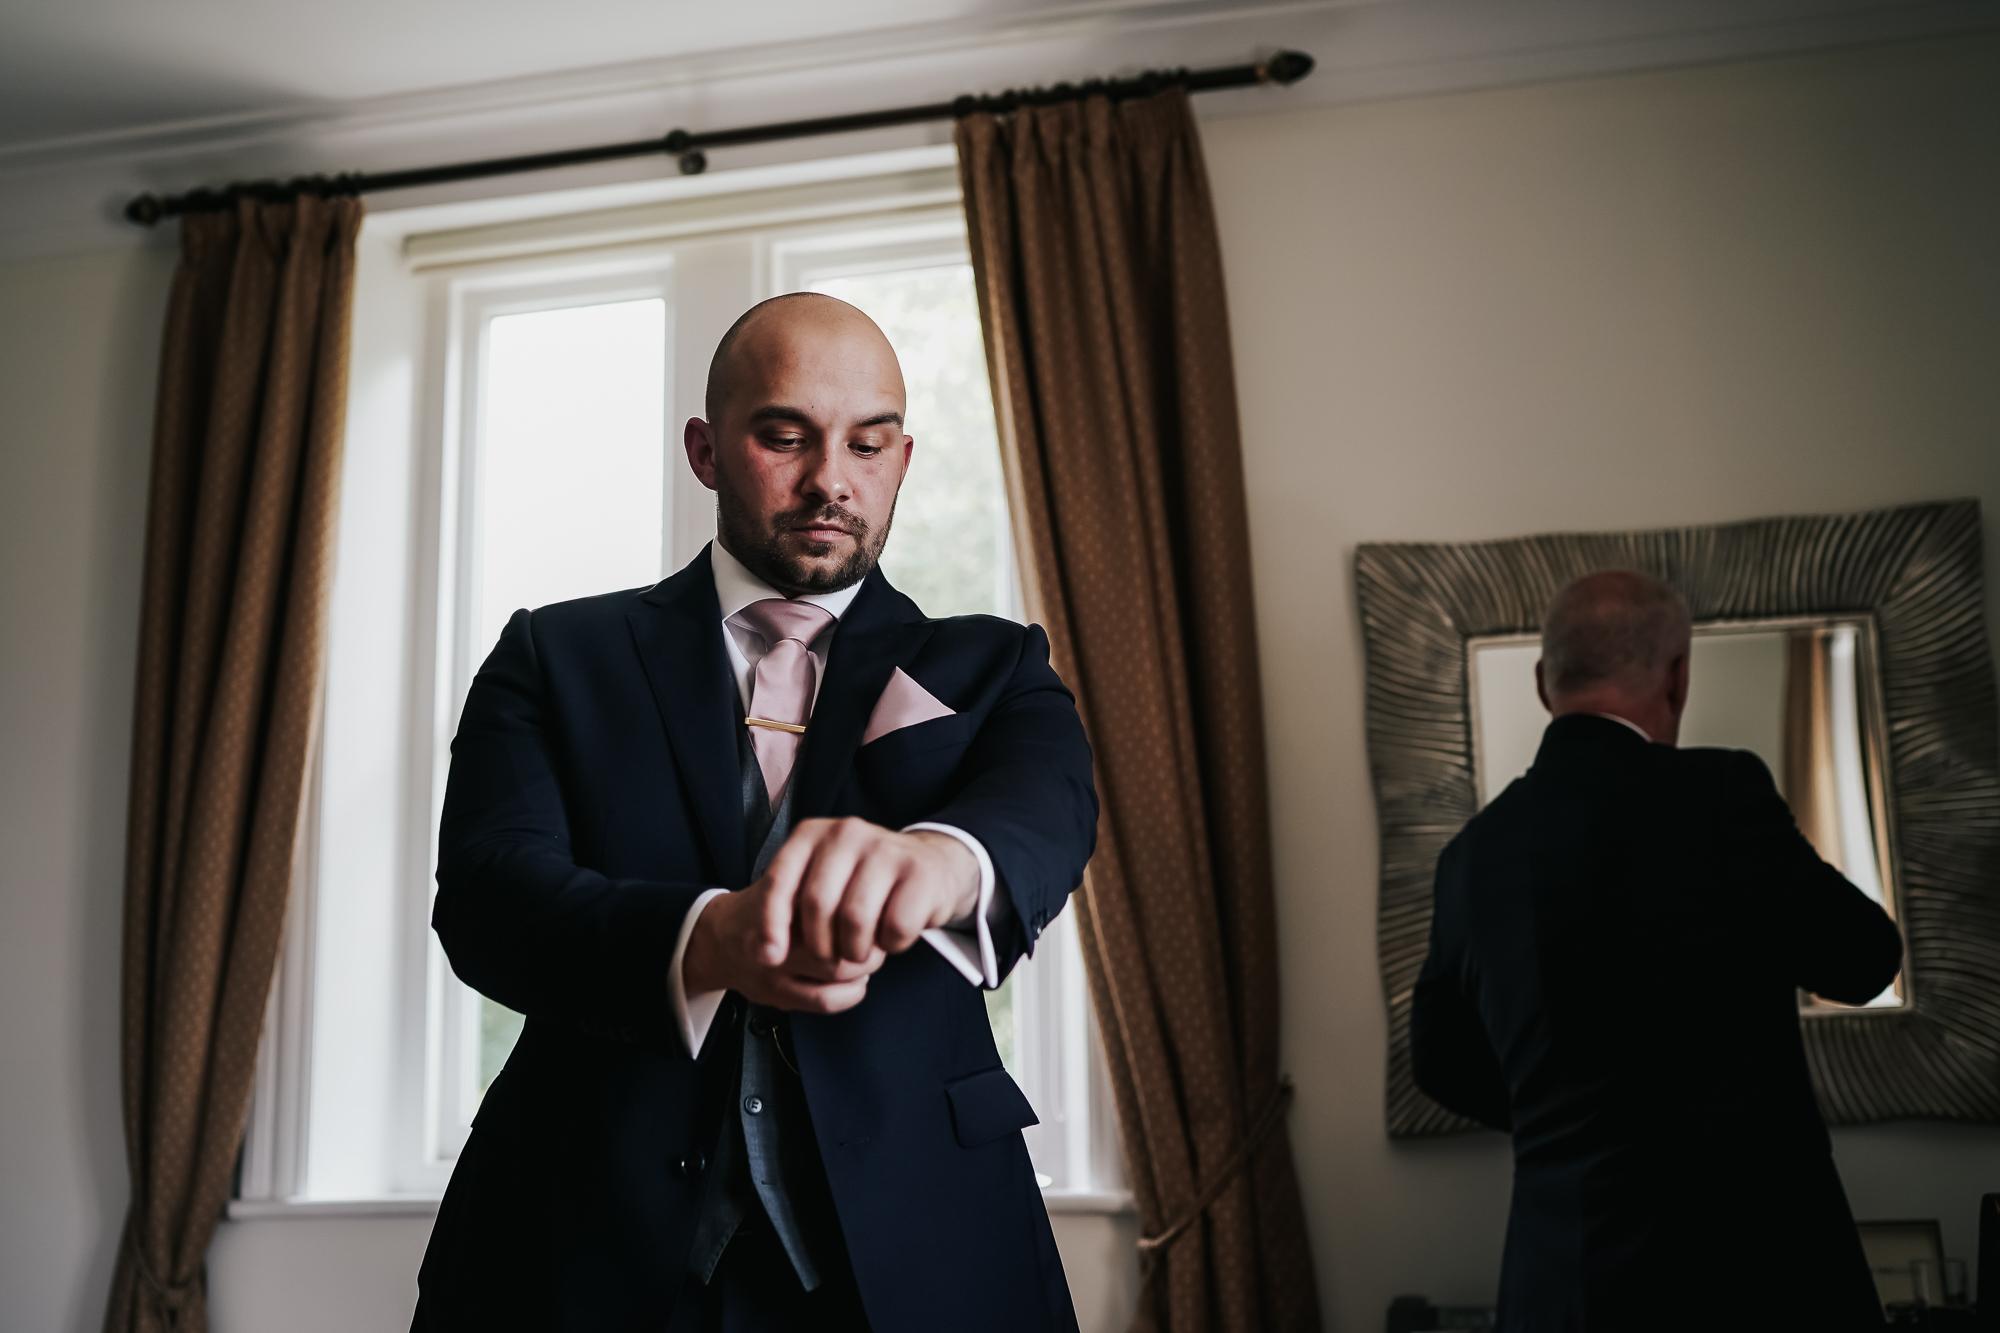 West Tower Wedding Photographer Ormskirk Lancashire wedding photography (3 of 3).jpg